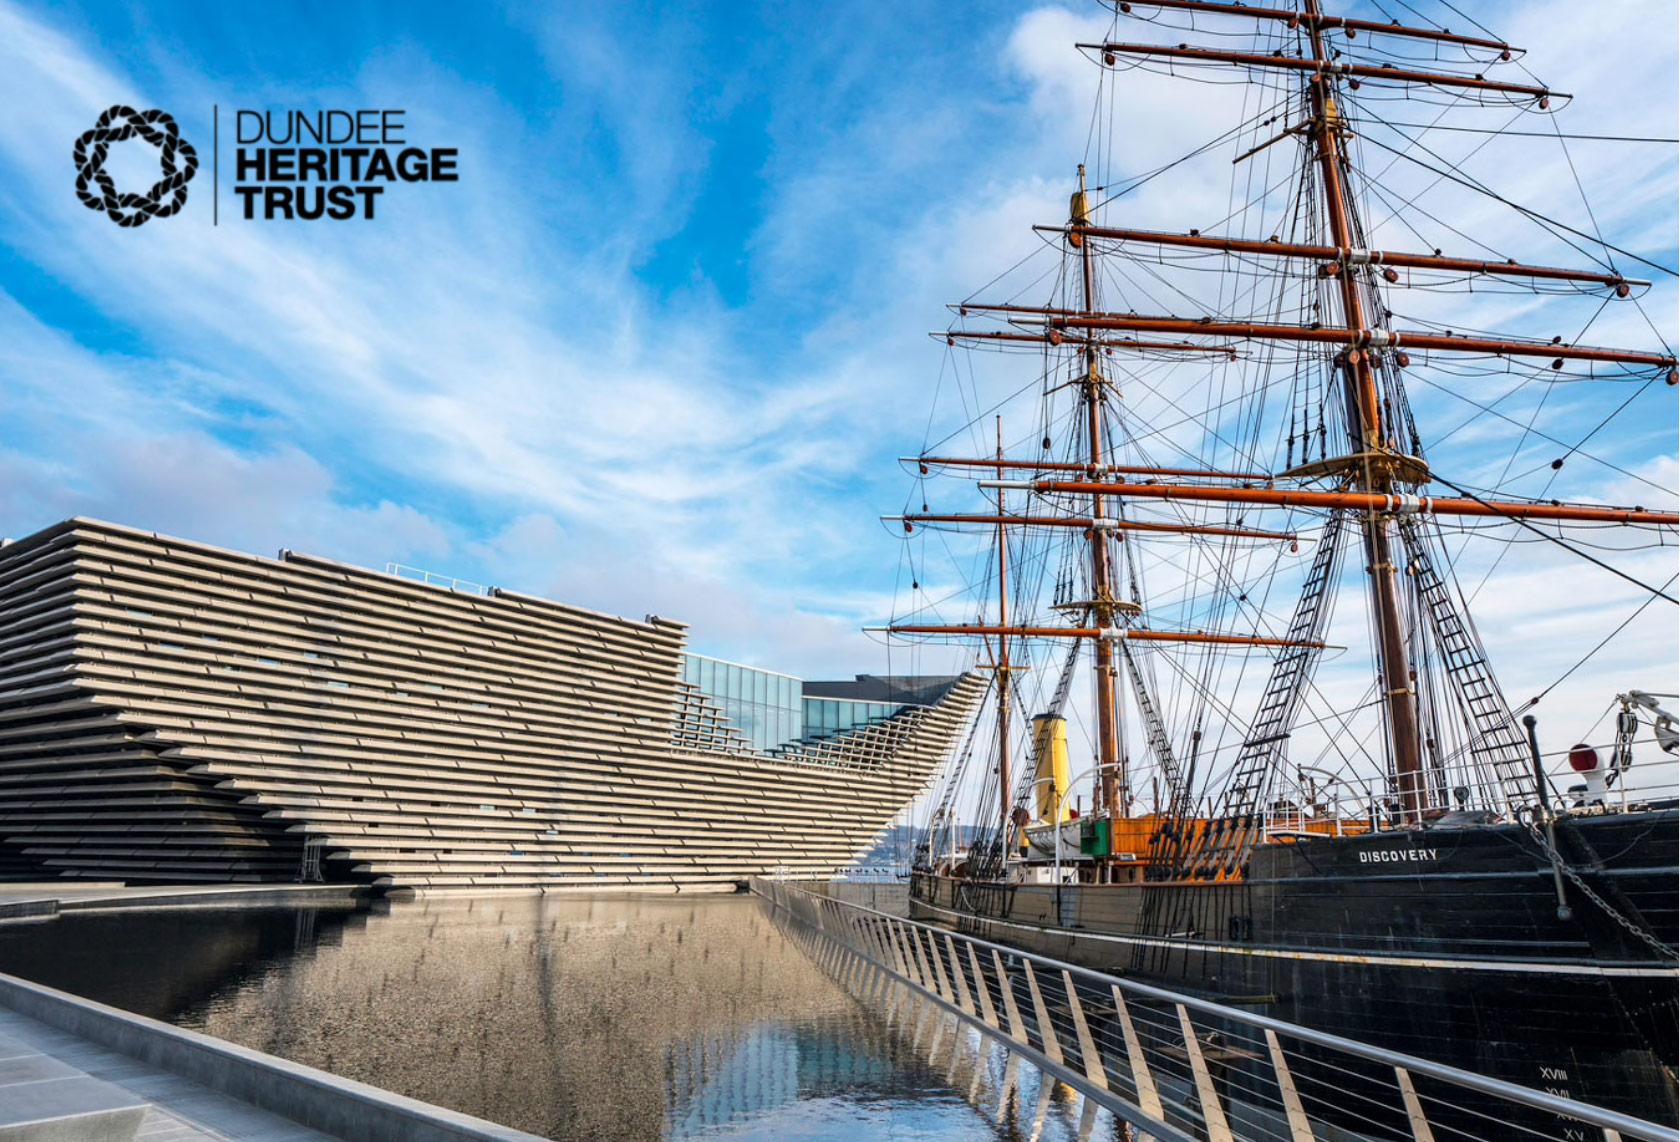 Dundee Herritage Trust